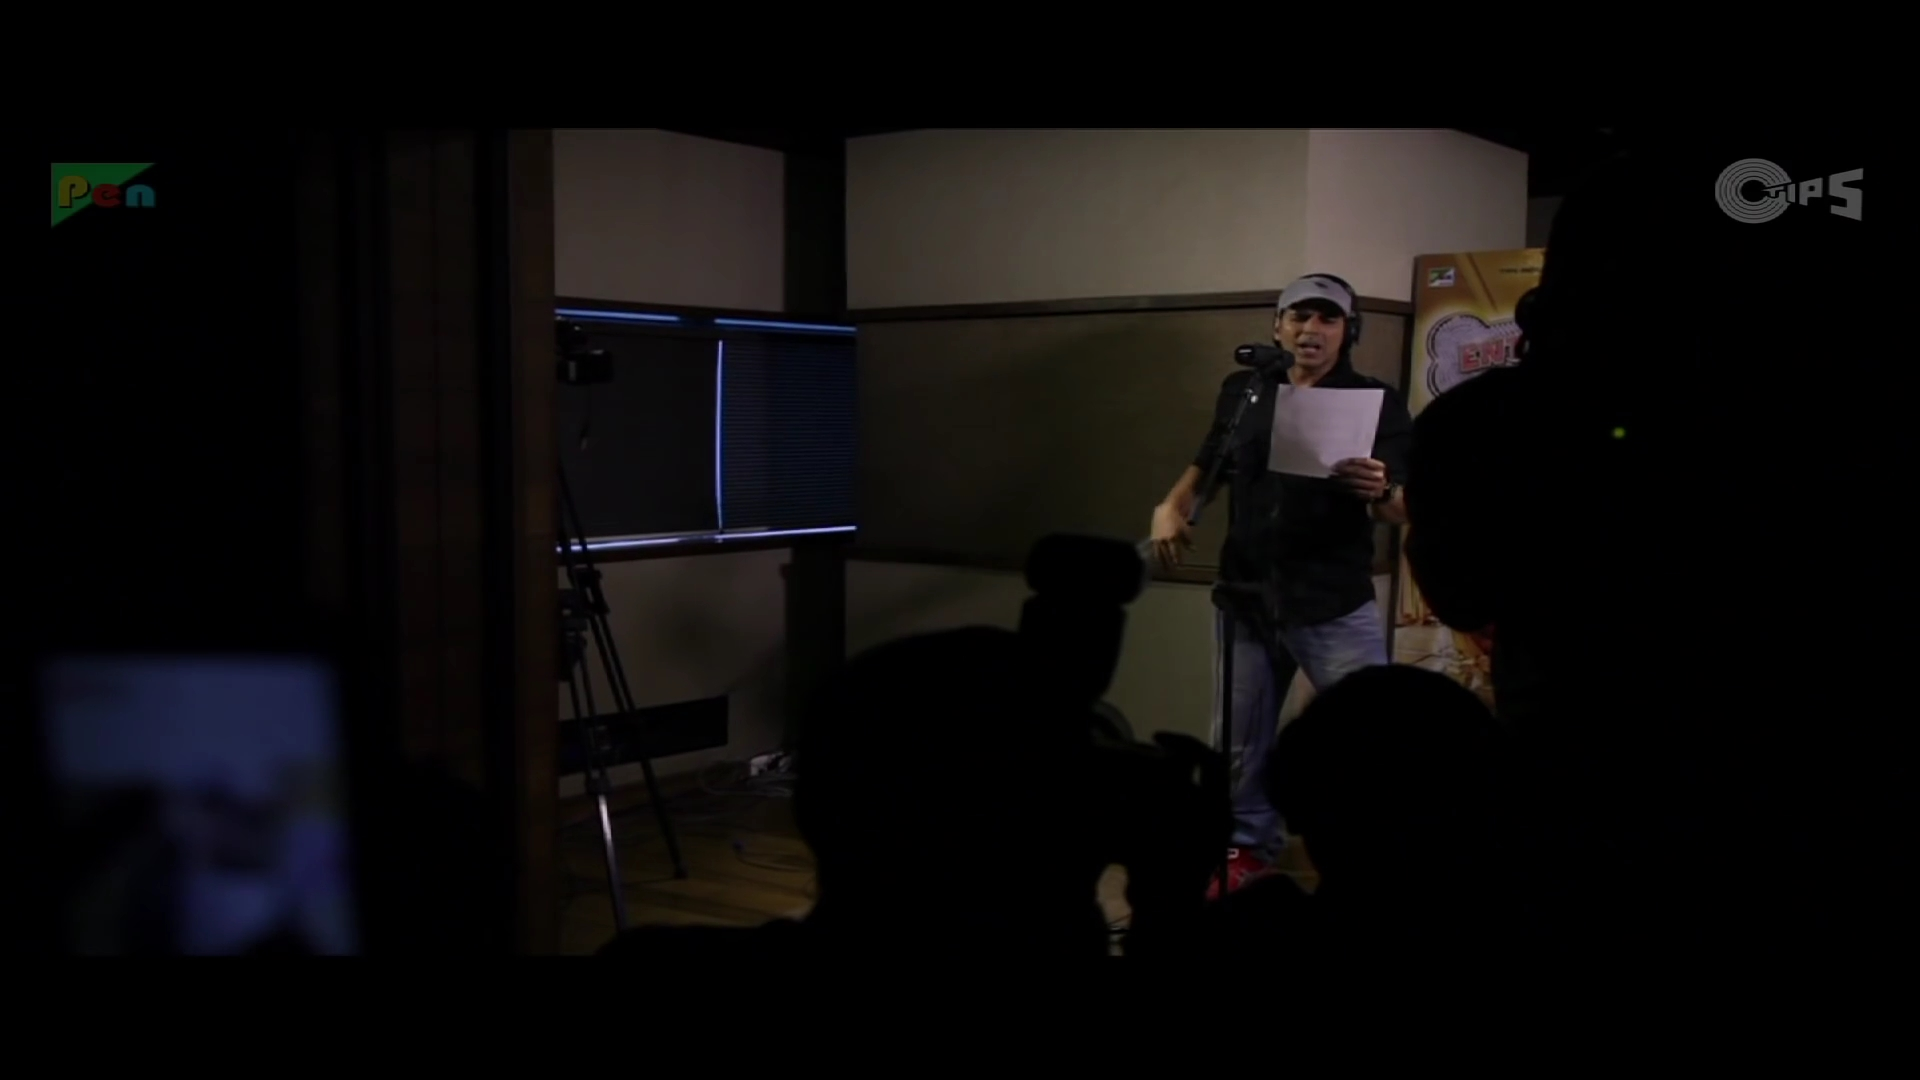 z_2014 - Akshay Kumar Sings  Maange Maange - Entertainment_1080p.mp46760.jpg